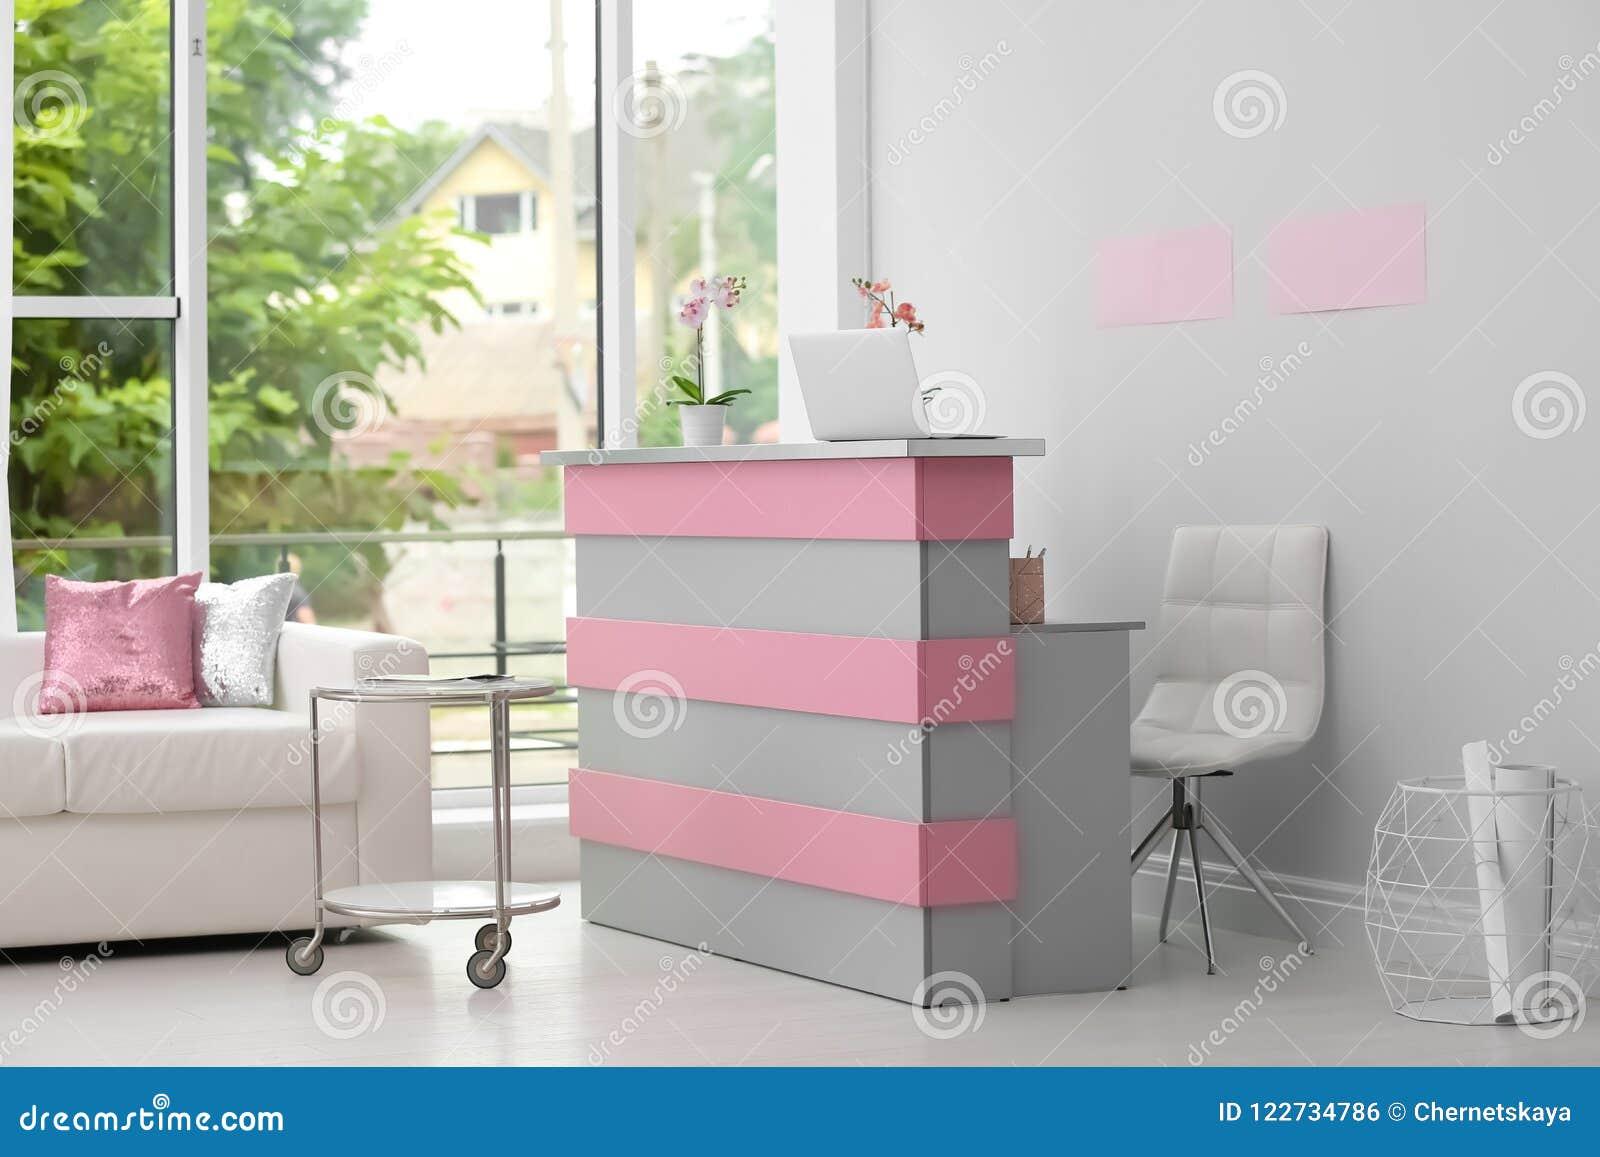 Reception Desk In Beauty Salon Stock Photo Image Of Fashion